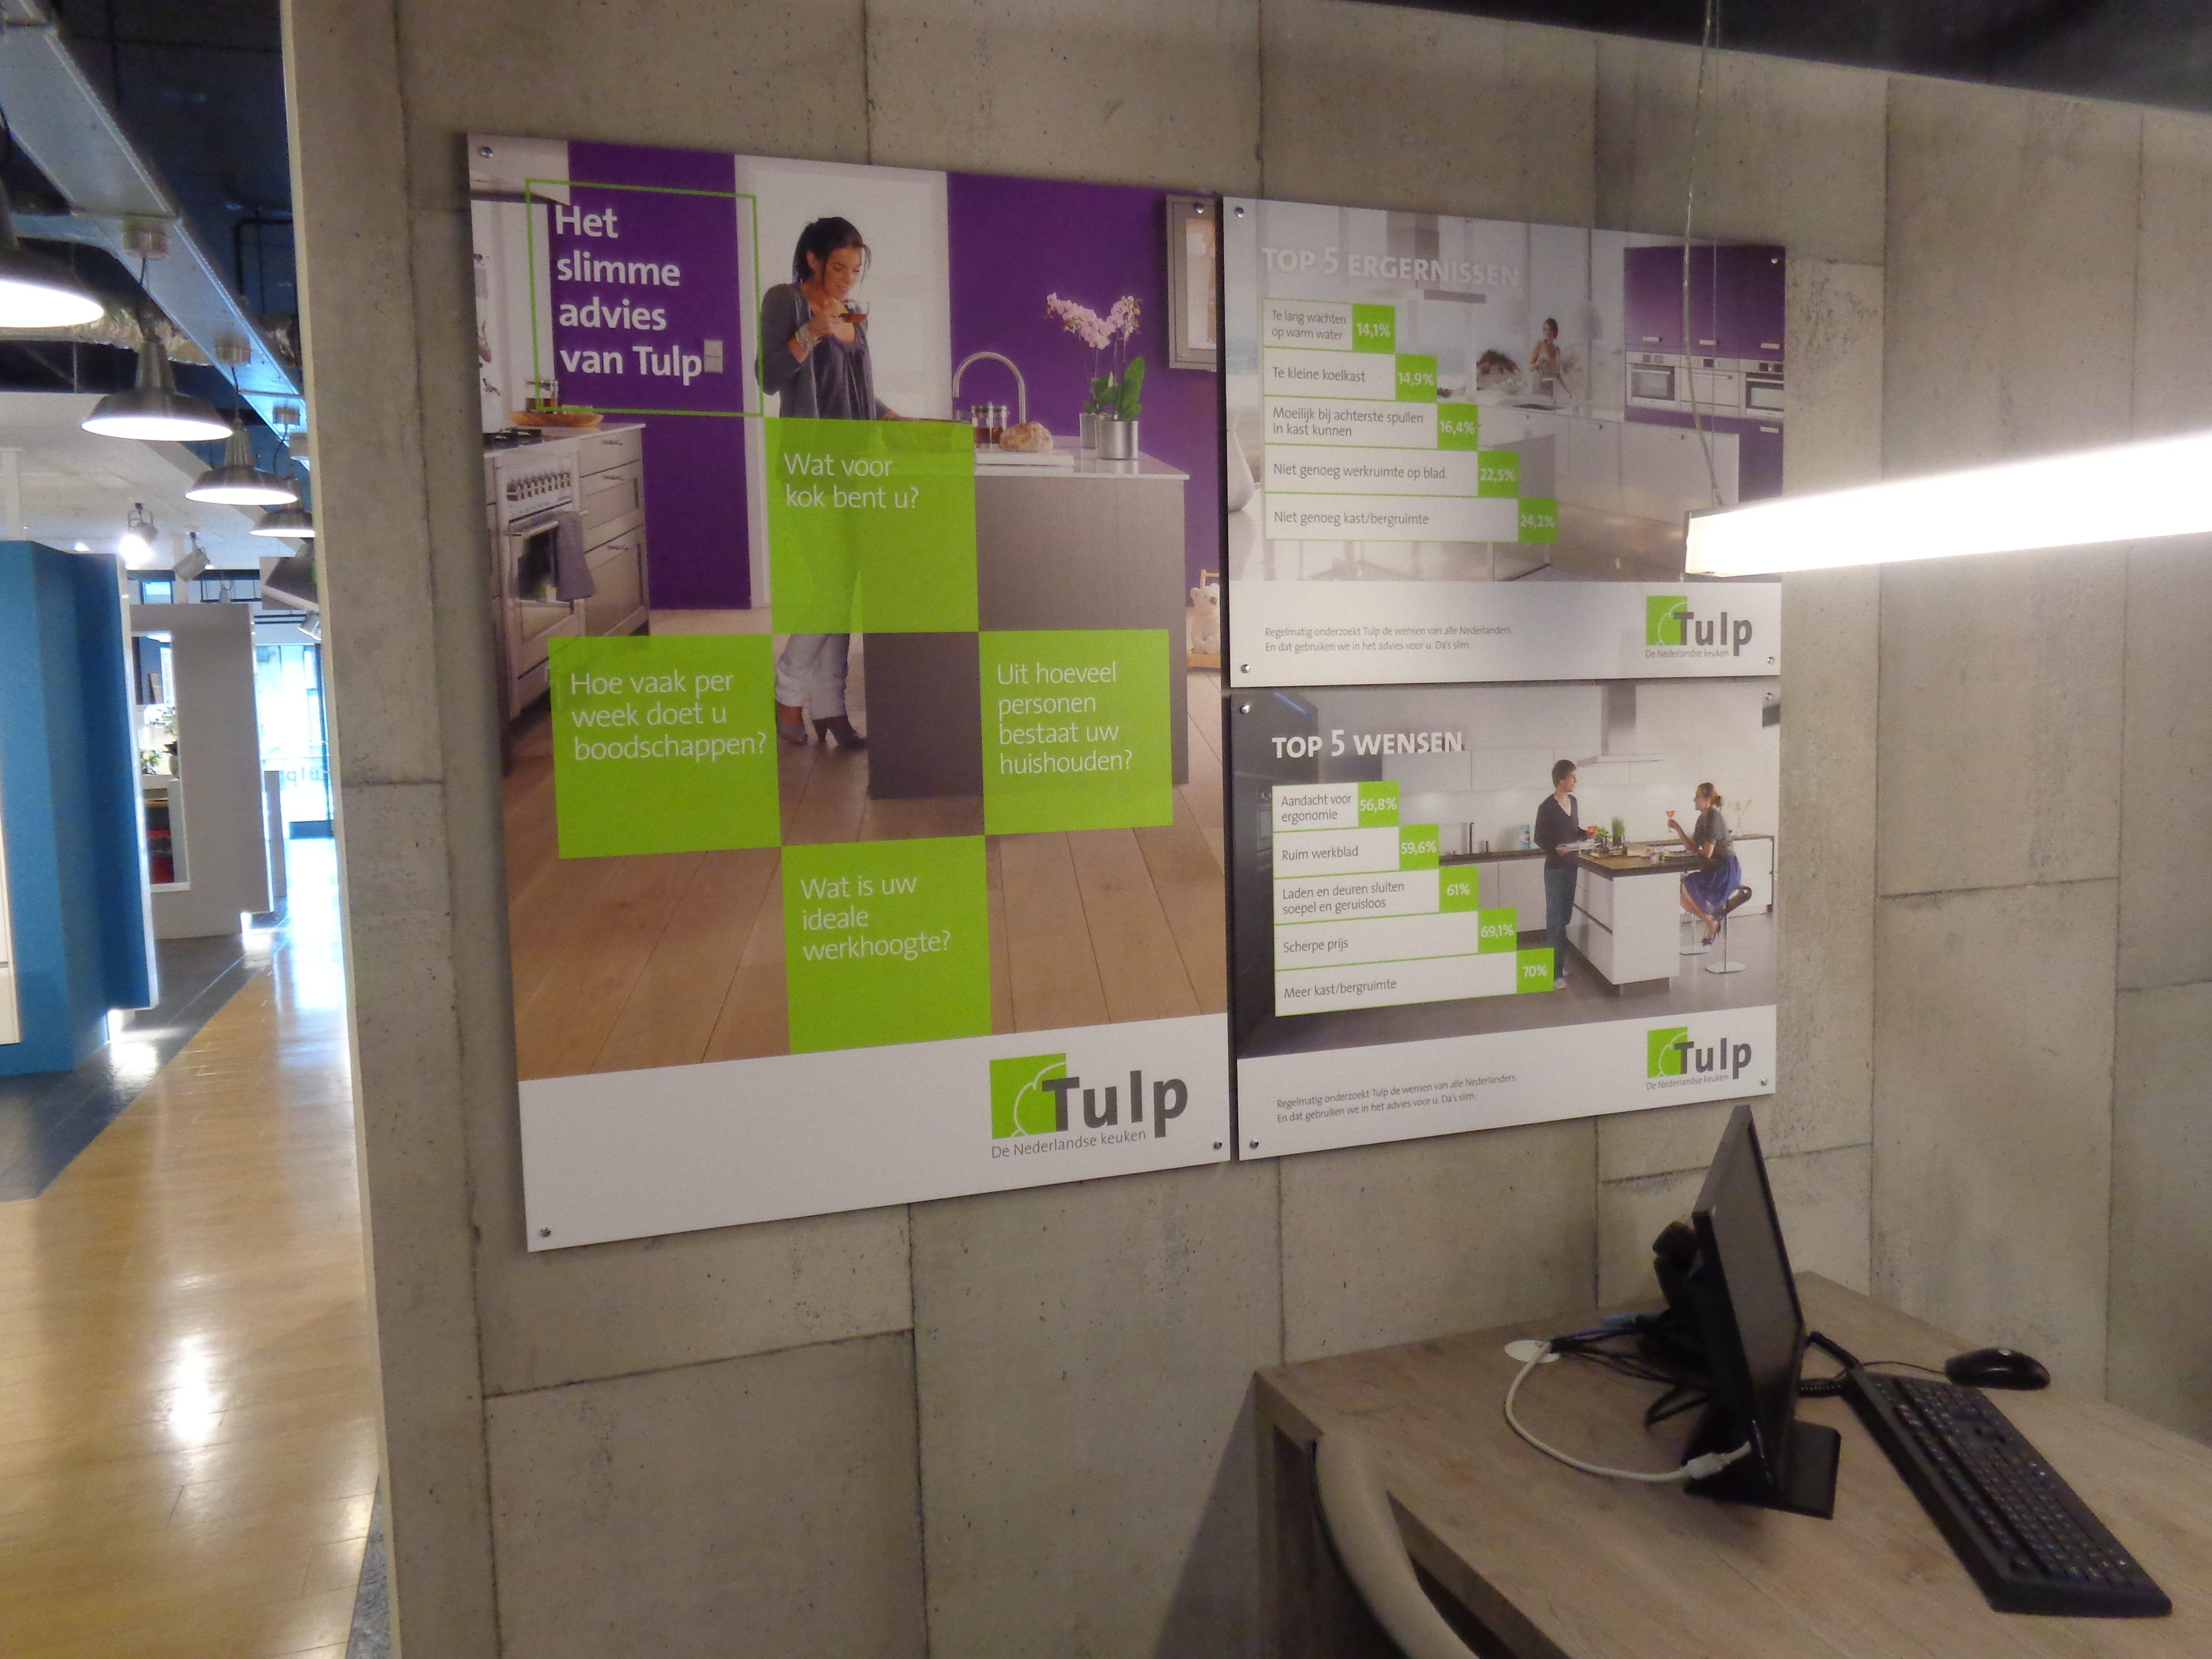 Tulp Keukens Rijssen : Lovely tulp keukens breda keukens apparatuur